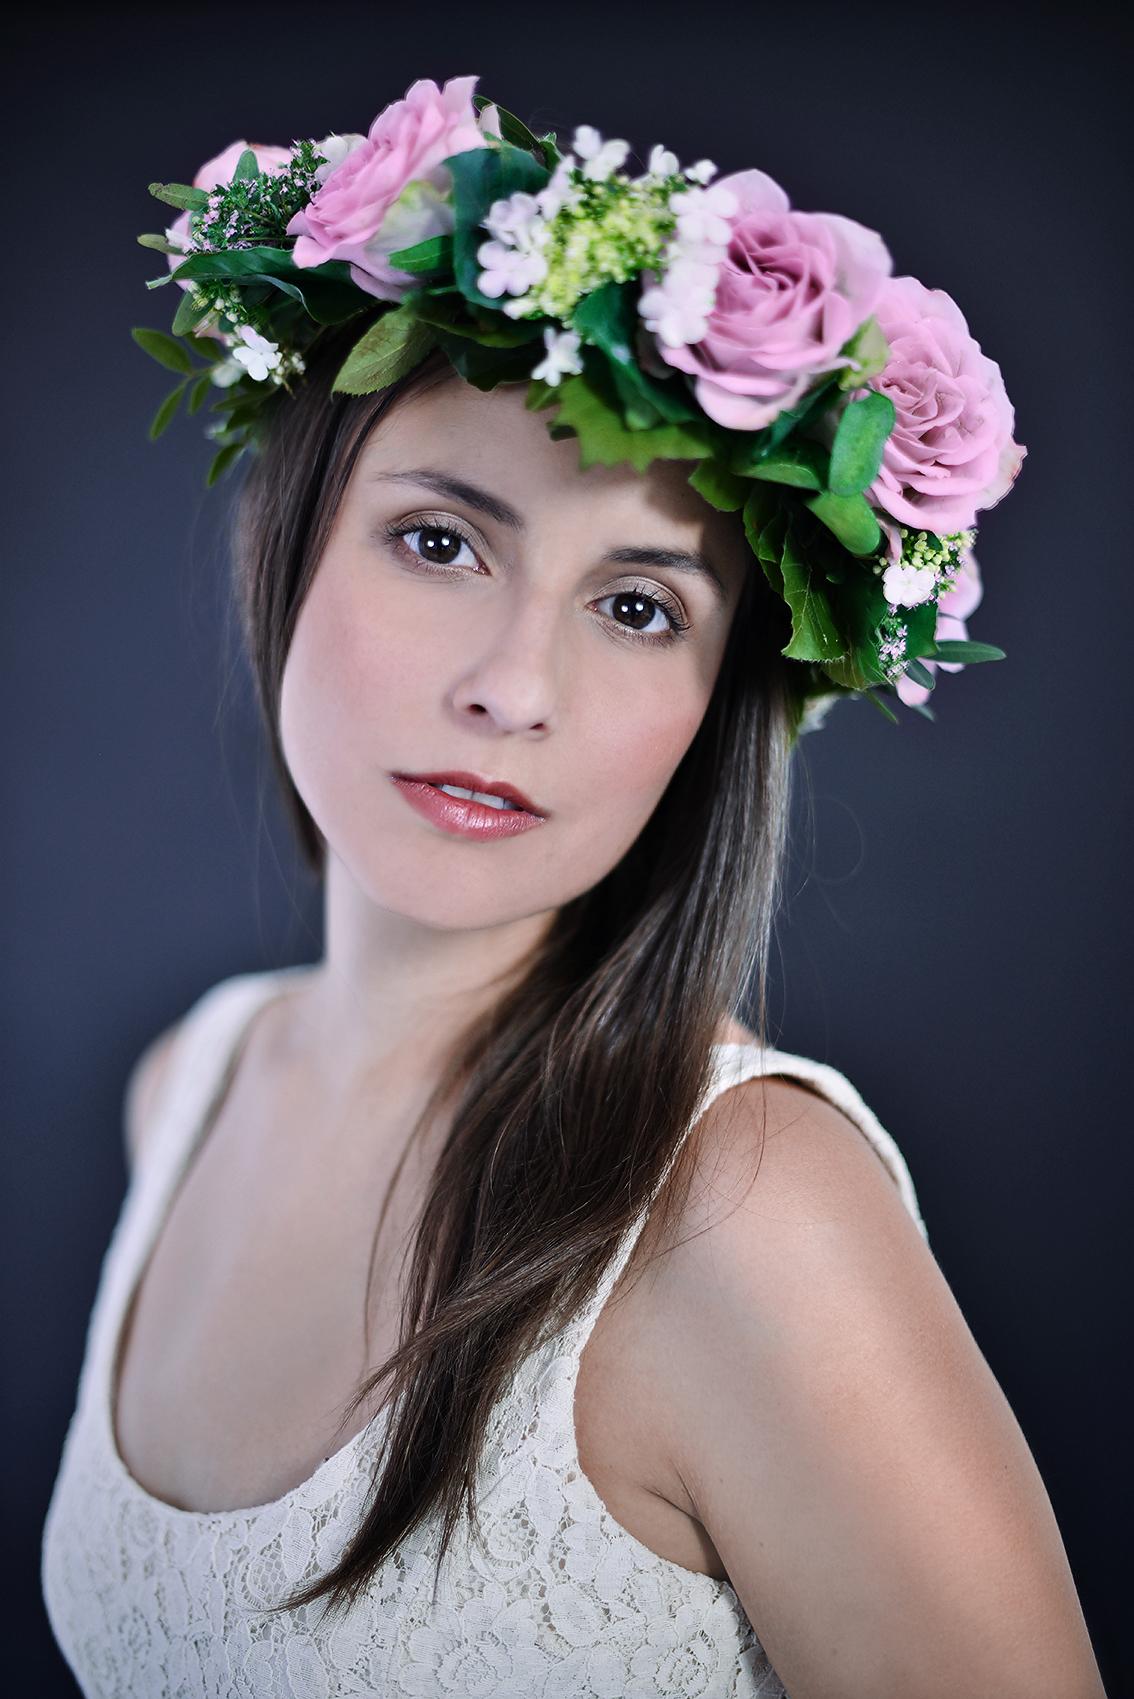 Martina_Portrait.jpg